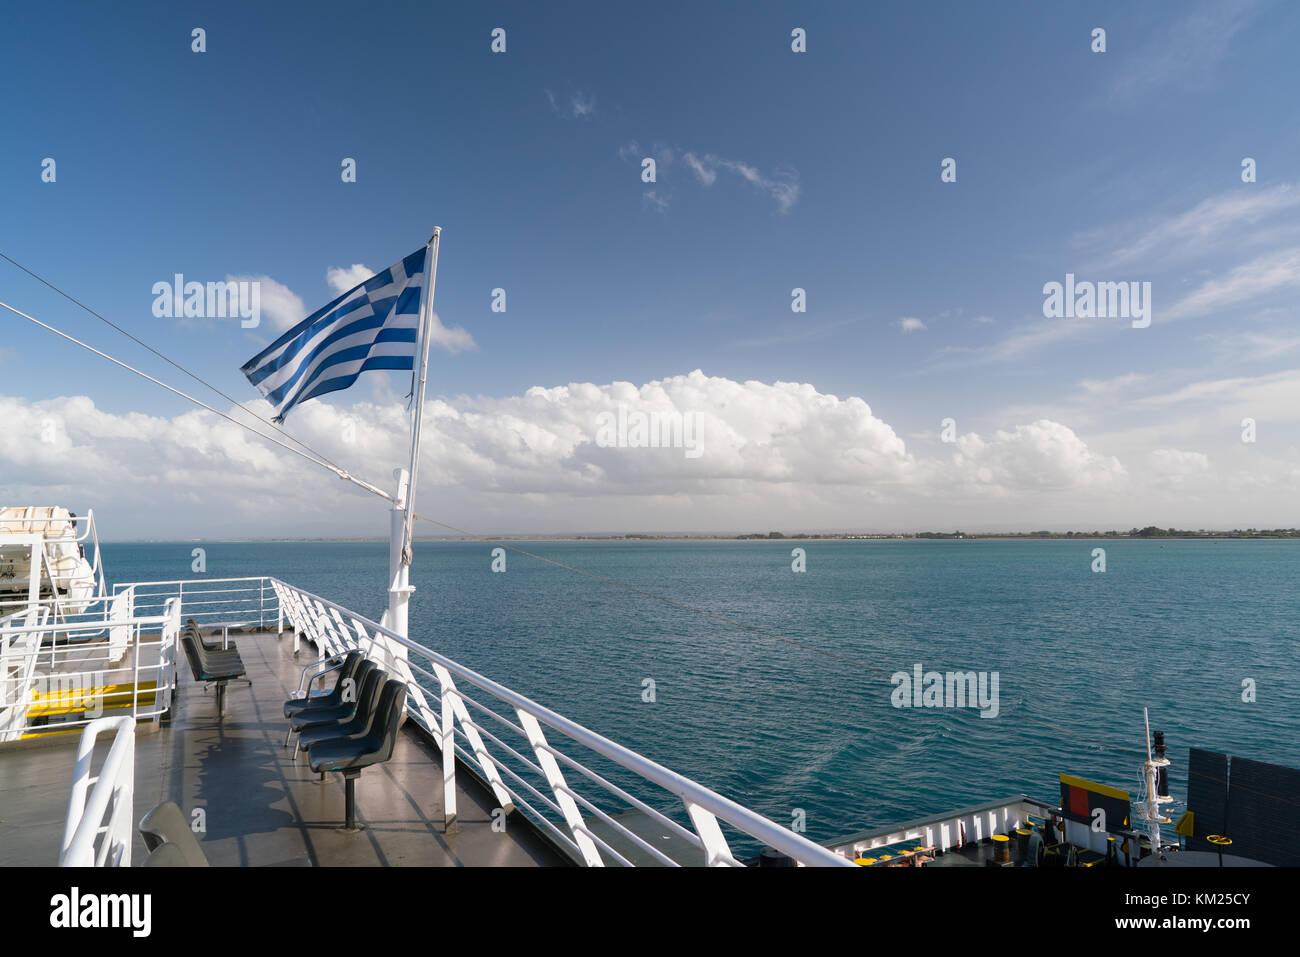 ferry greece deck stockfotos ferry greece deck bilder. Black Bedroom Furniture Sets. Home Design Ideas